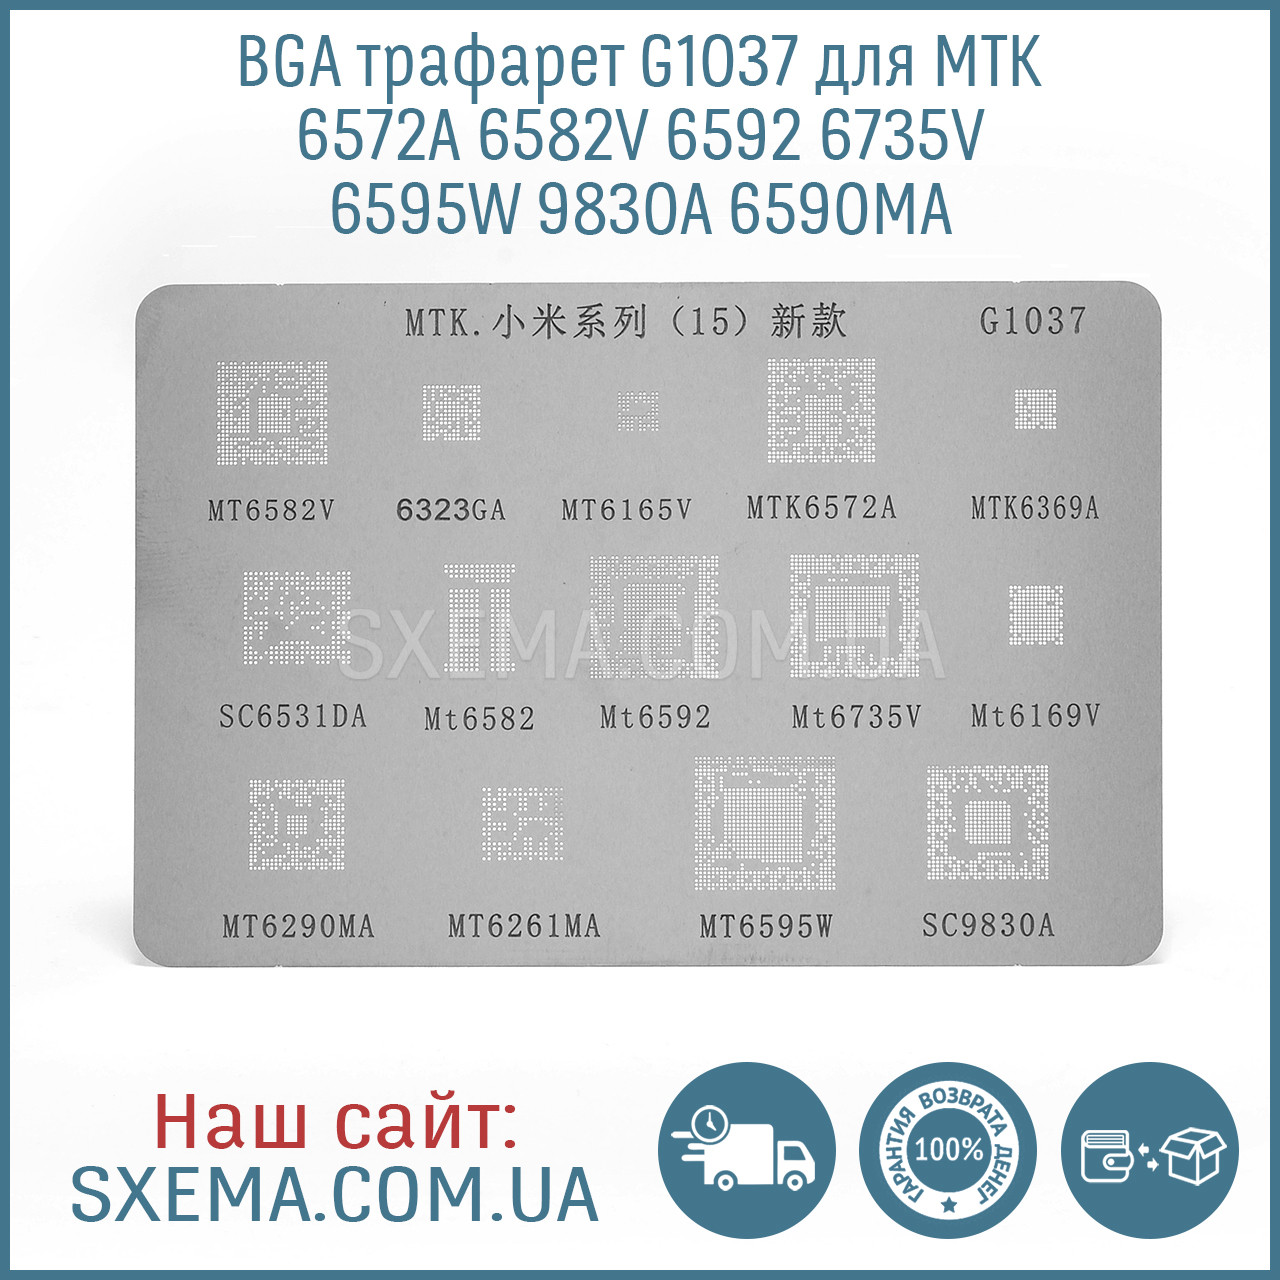 BGA трафарет G1037 для MTK 6572A 6582V 6592 6735V 6595W 9830A 6590MA